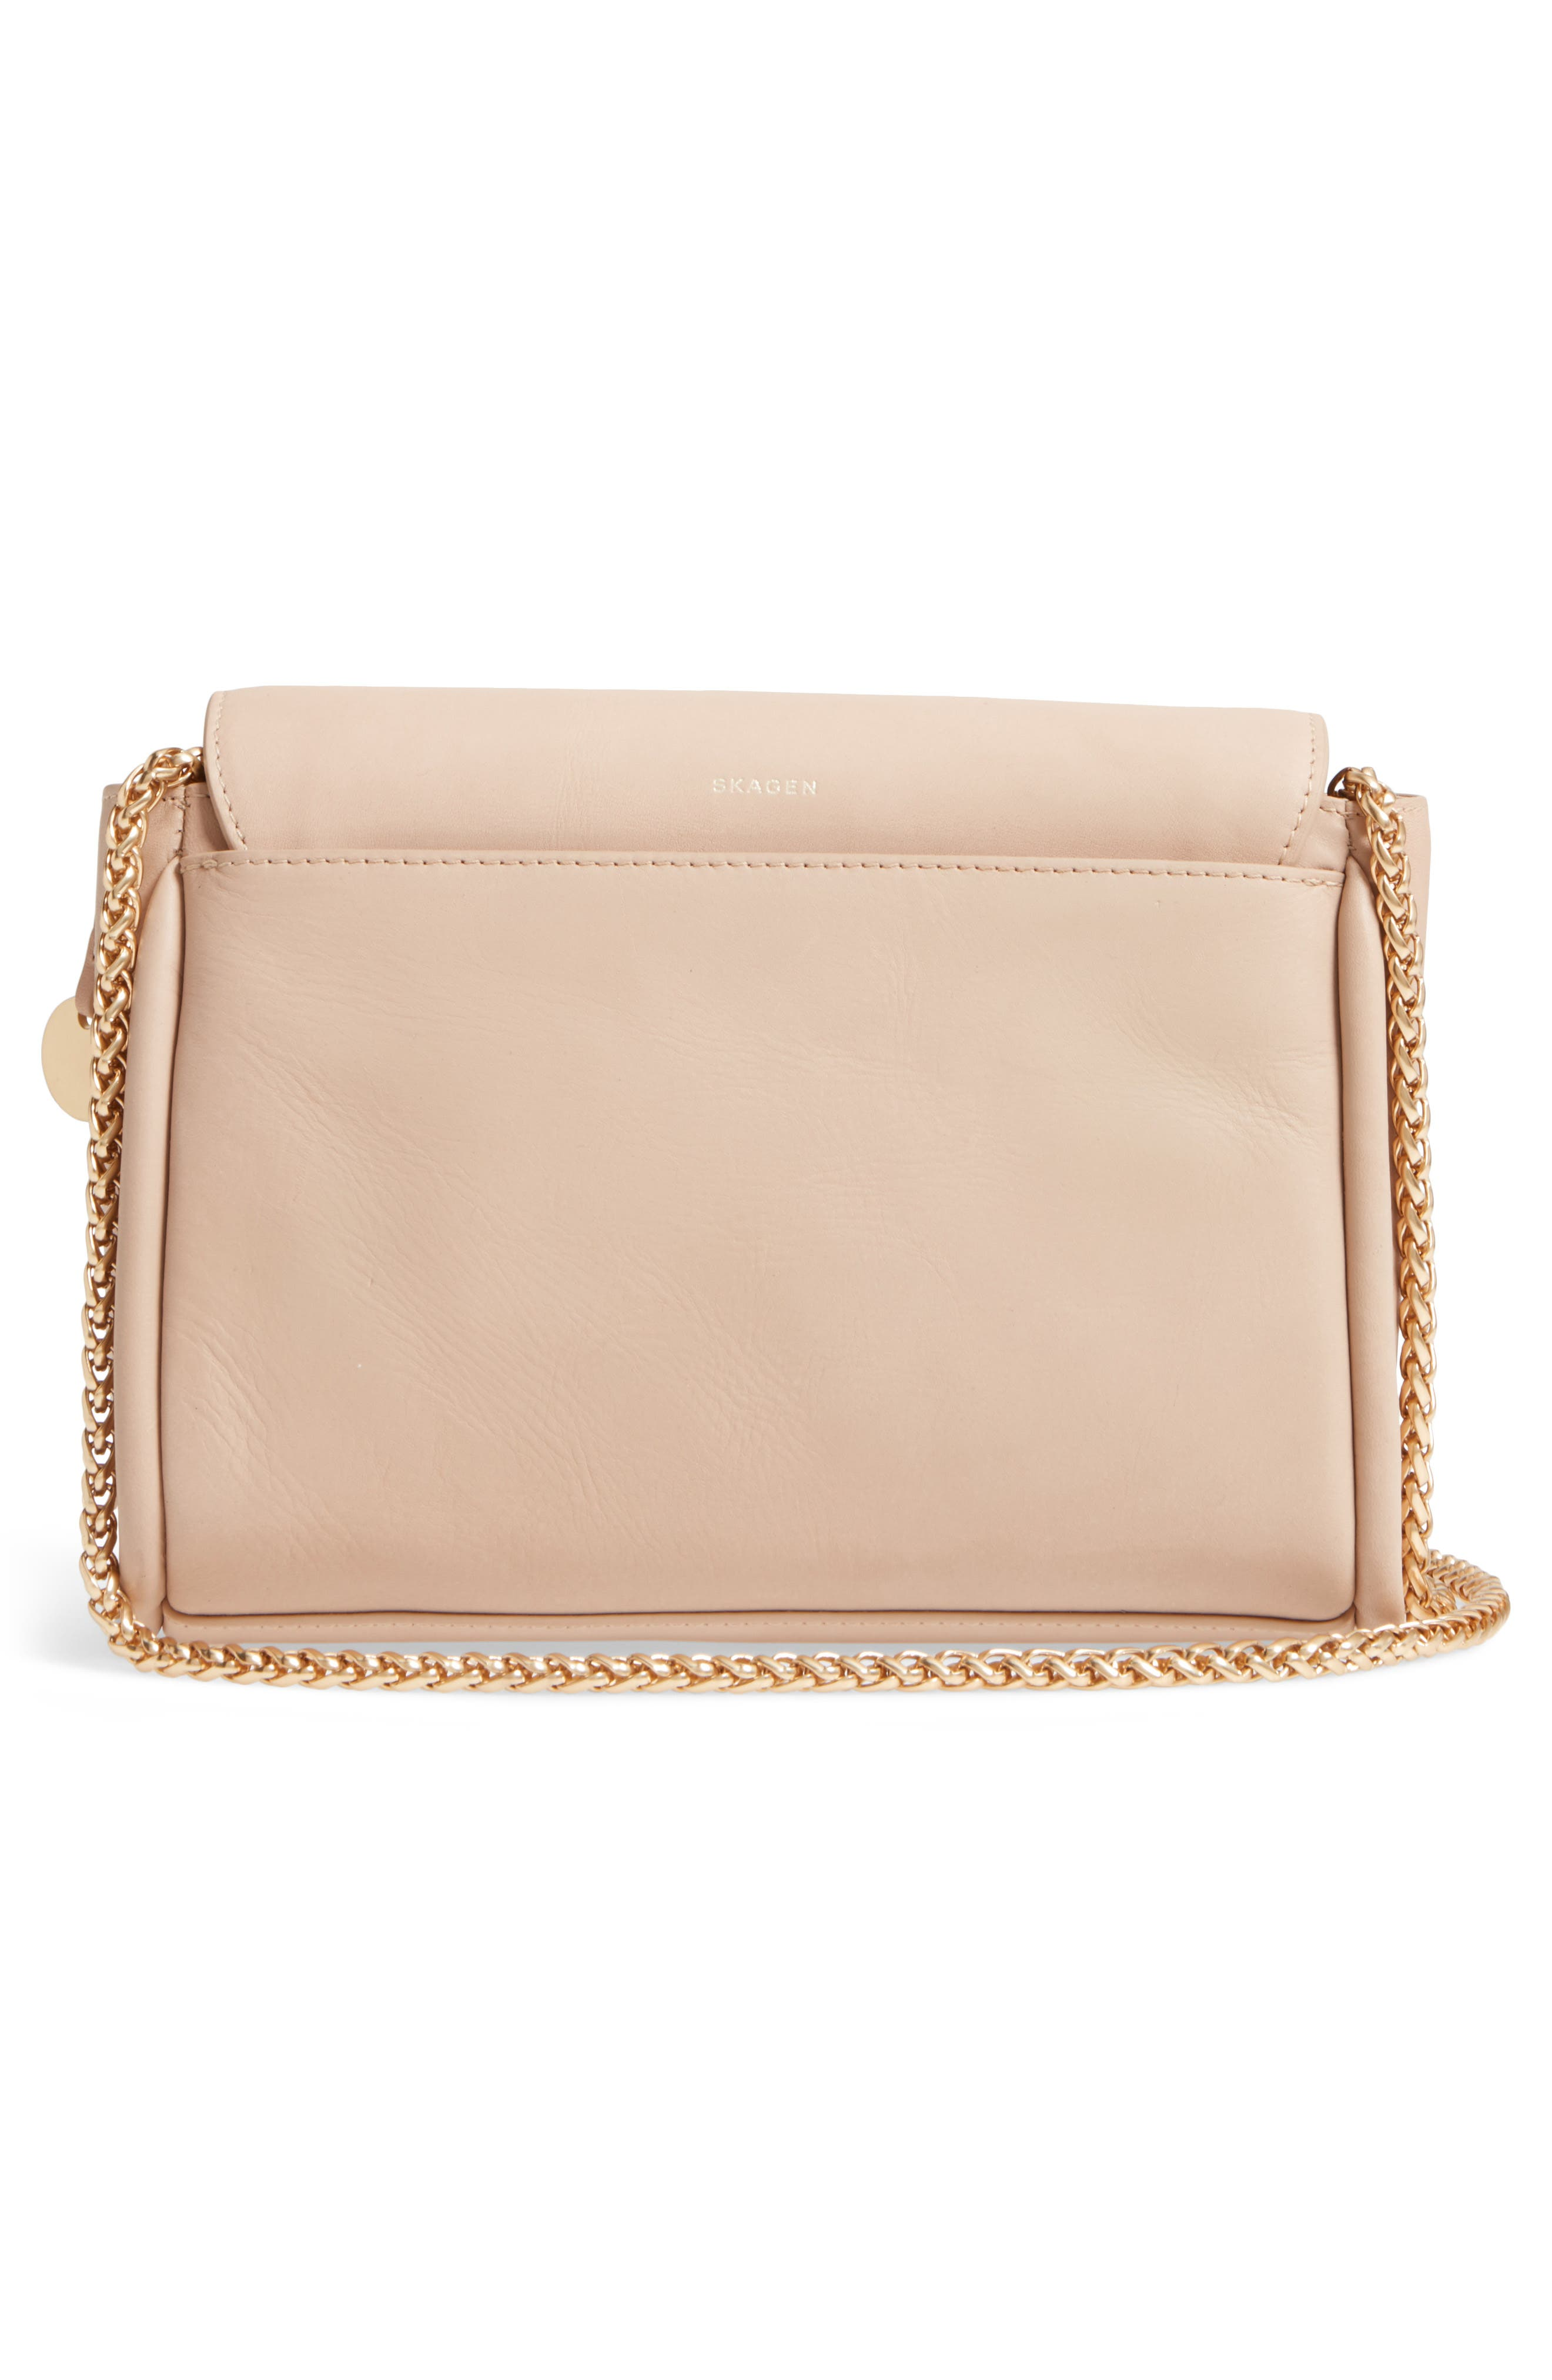 Sylvi Calfskin Leather Crossbody Bag,                             Alternate thumbnail 2, color,                             Beige